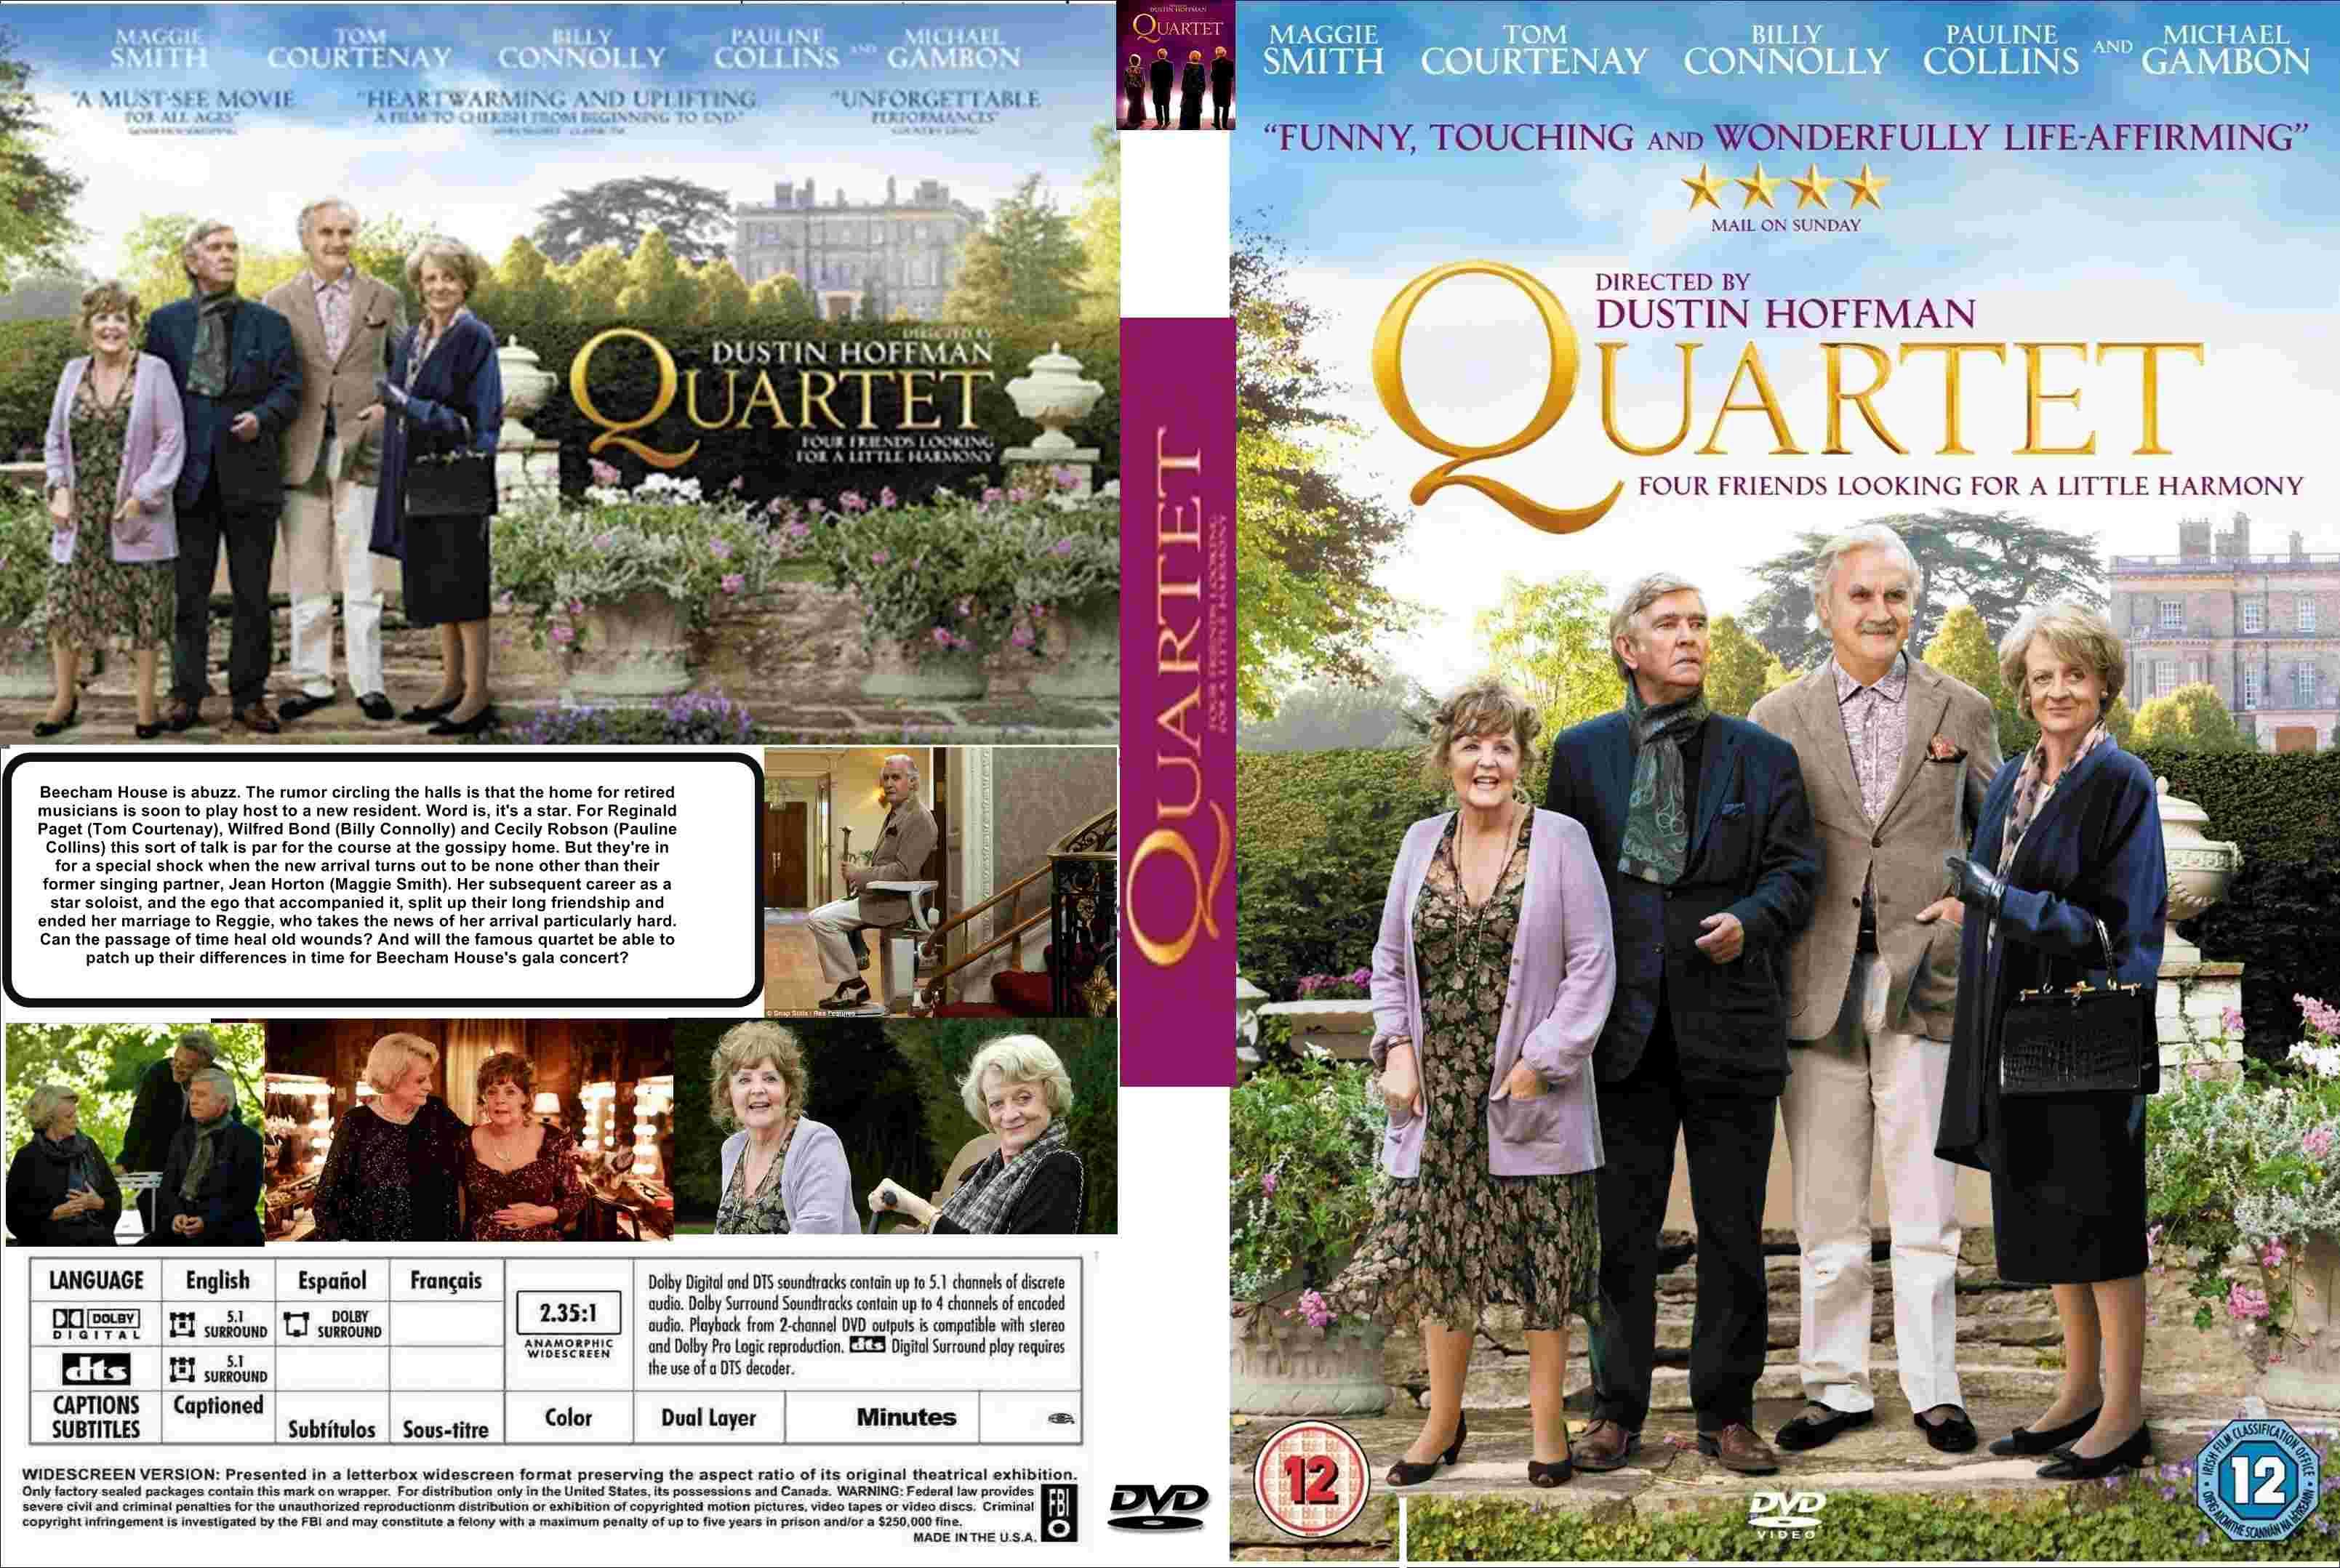 Quartet_(2012)_R0-[front]-[www.FreeCovers.net] | infi2011